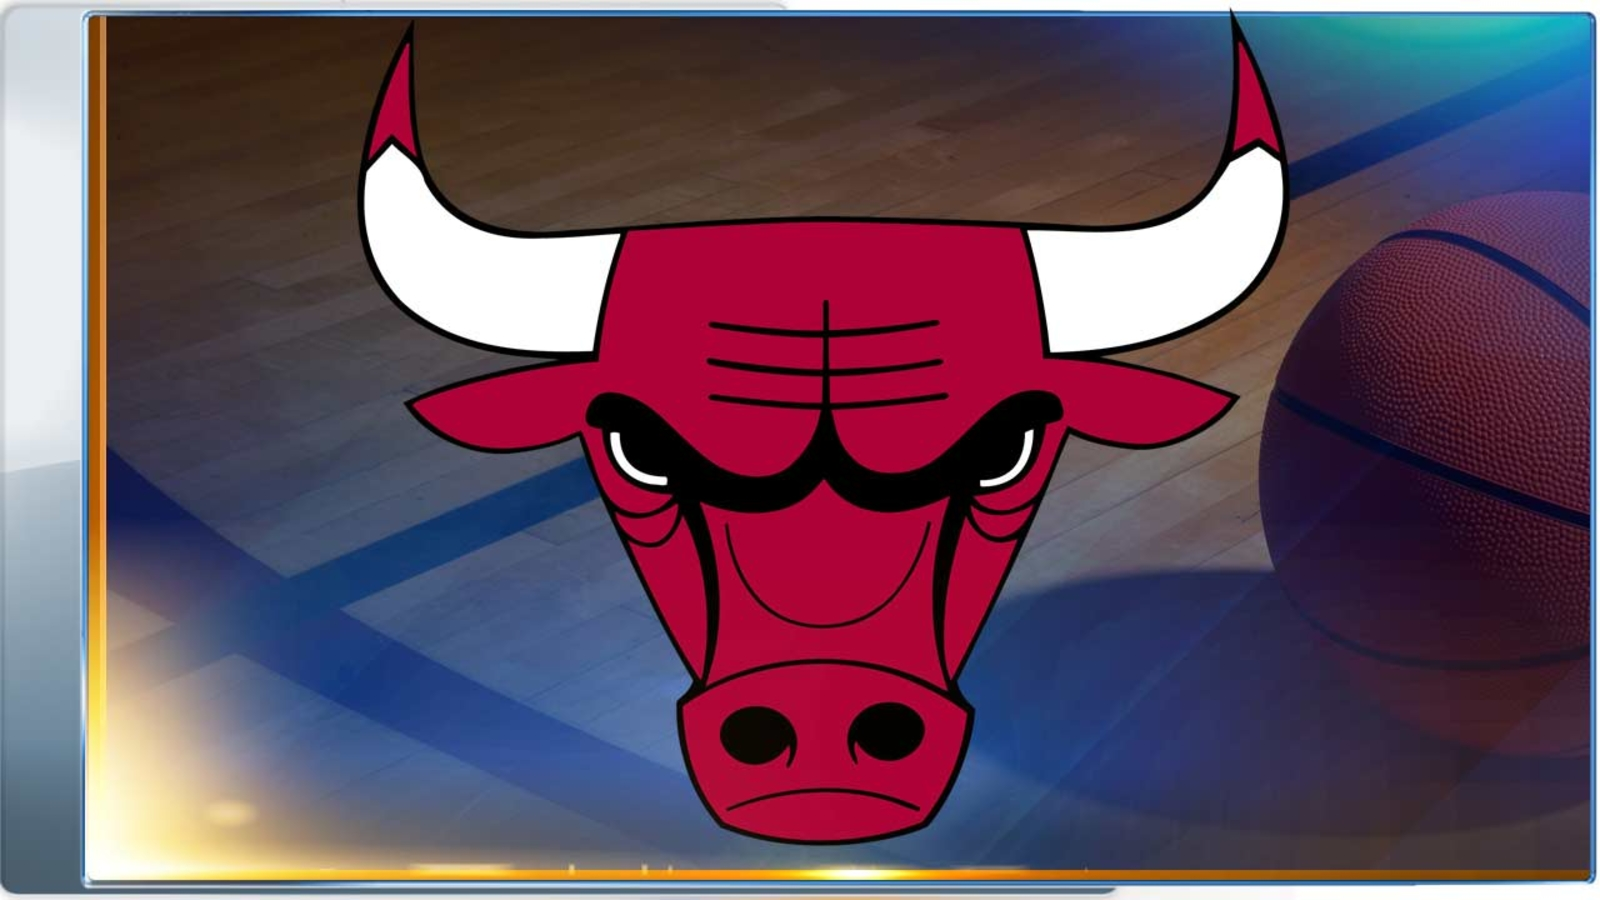 Chicago Bulls released 2019-2020 NBA basketball season ...